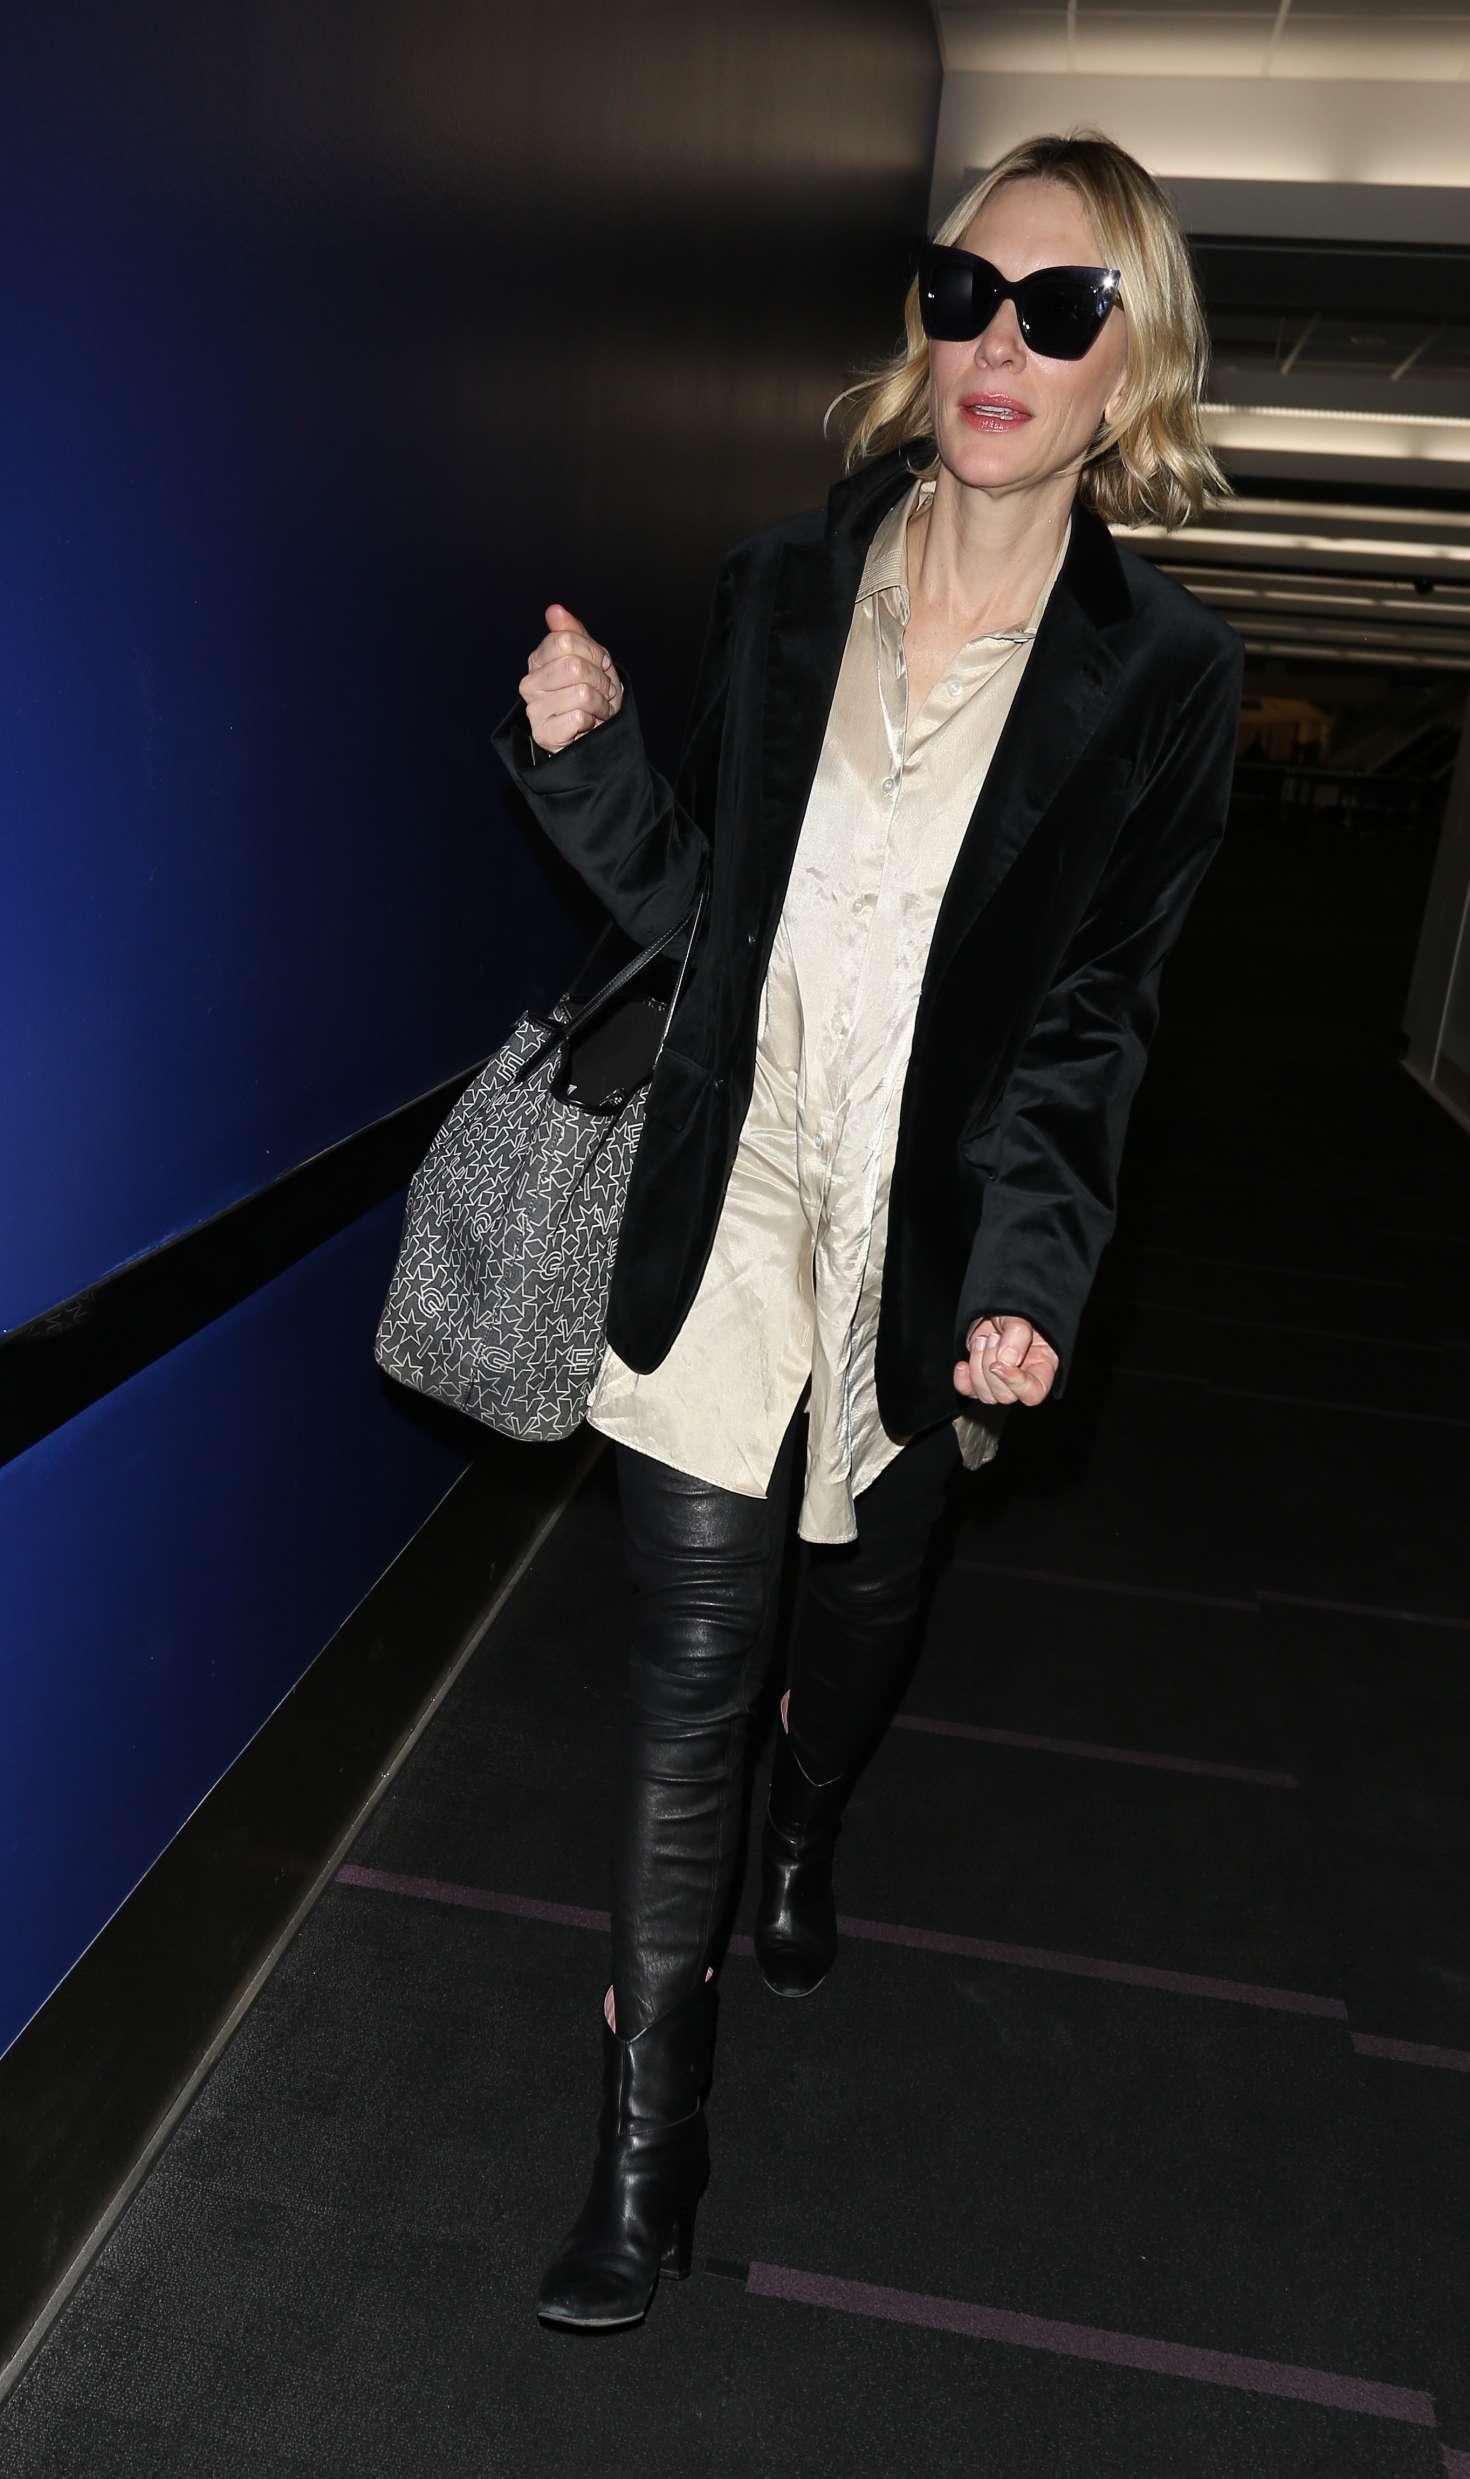 Cate Blanchett 2017 : Cate Blanchett at Los Angeles International Airport -05